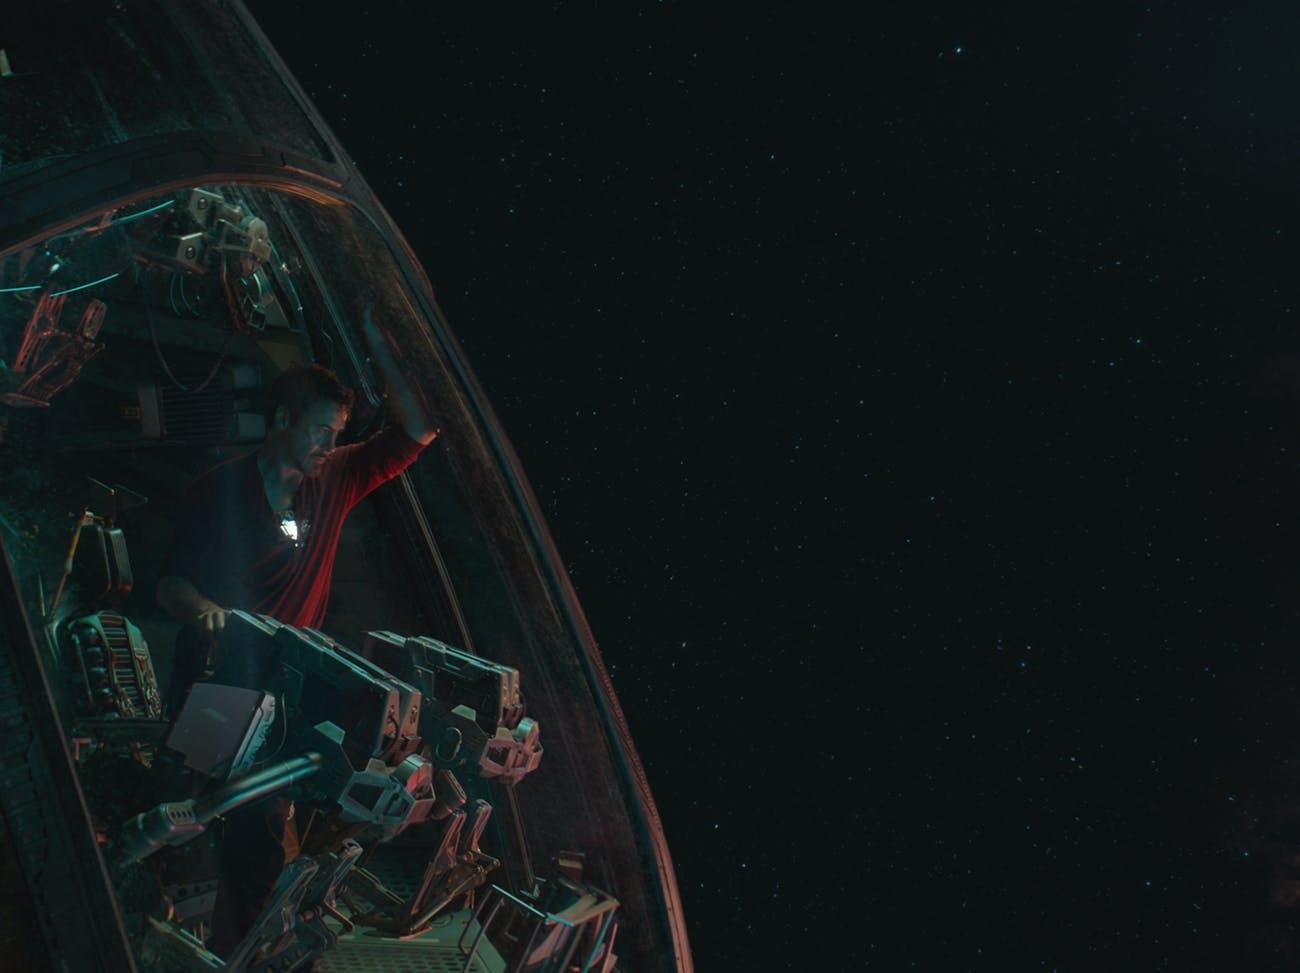 Avengers: Endgame' First 20 Minutes Leak, Revealing Some